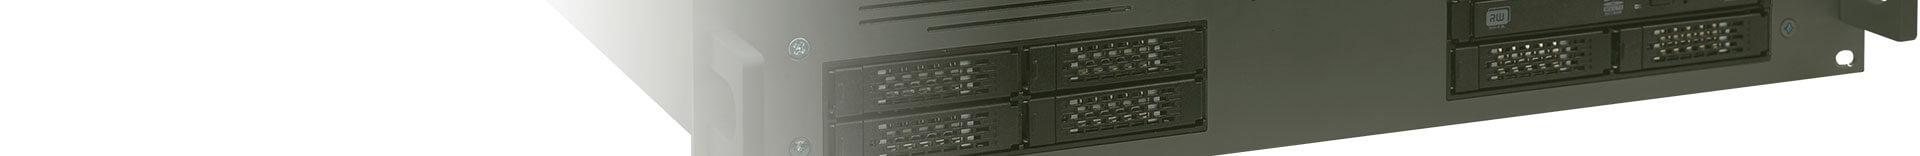 Wide Temperature Server & Workstation | APLUS SA | Defense & Security